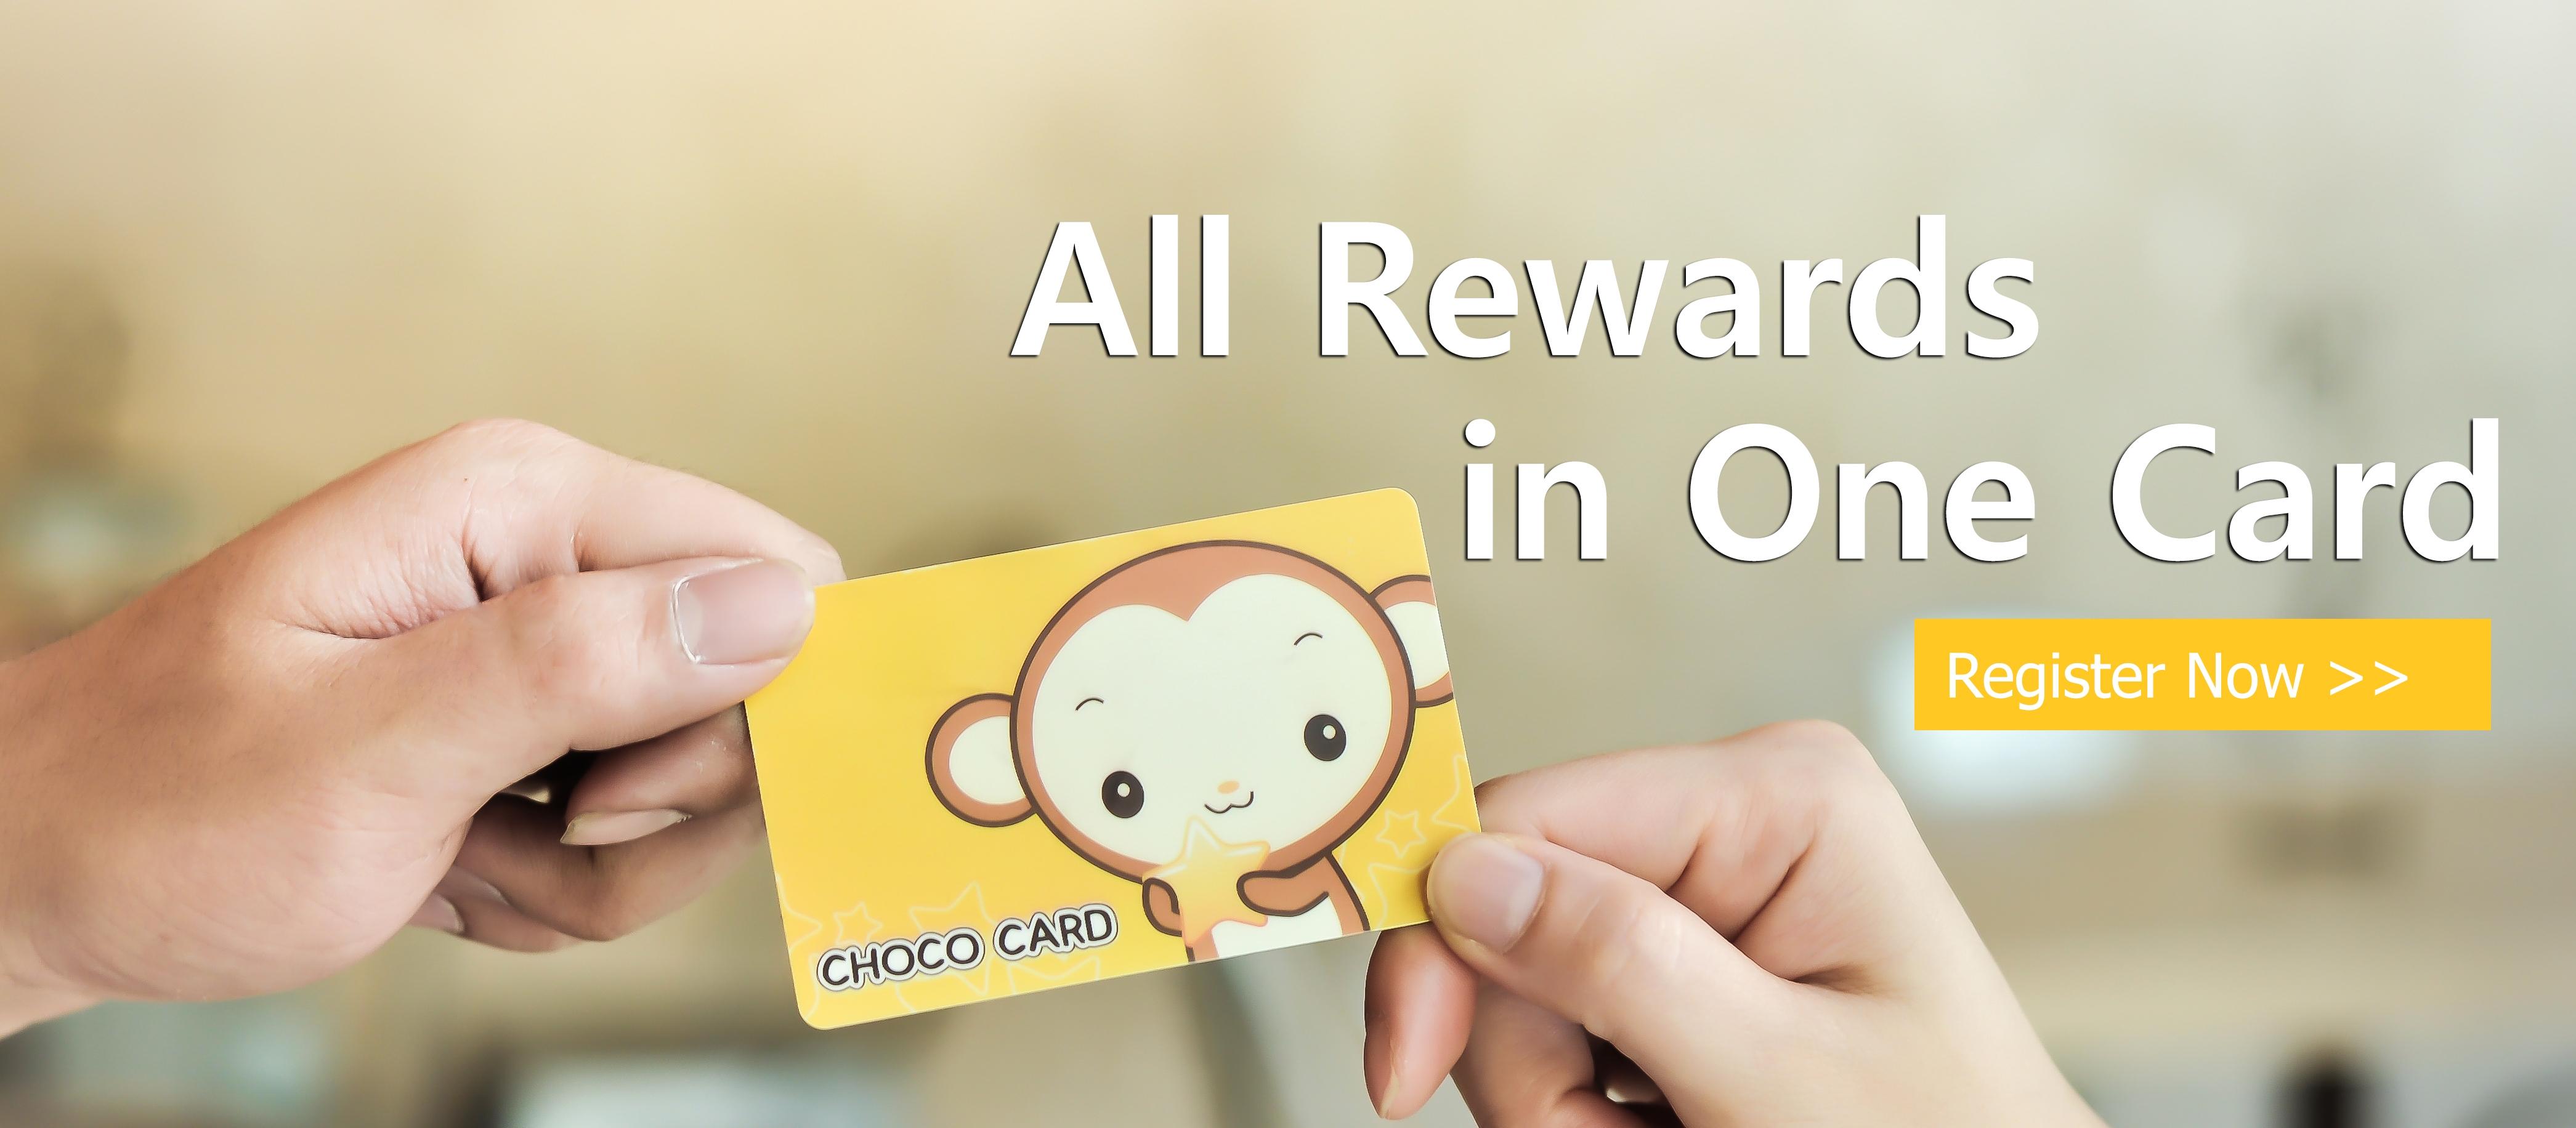 Choco Card Intro